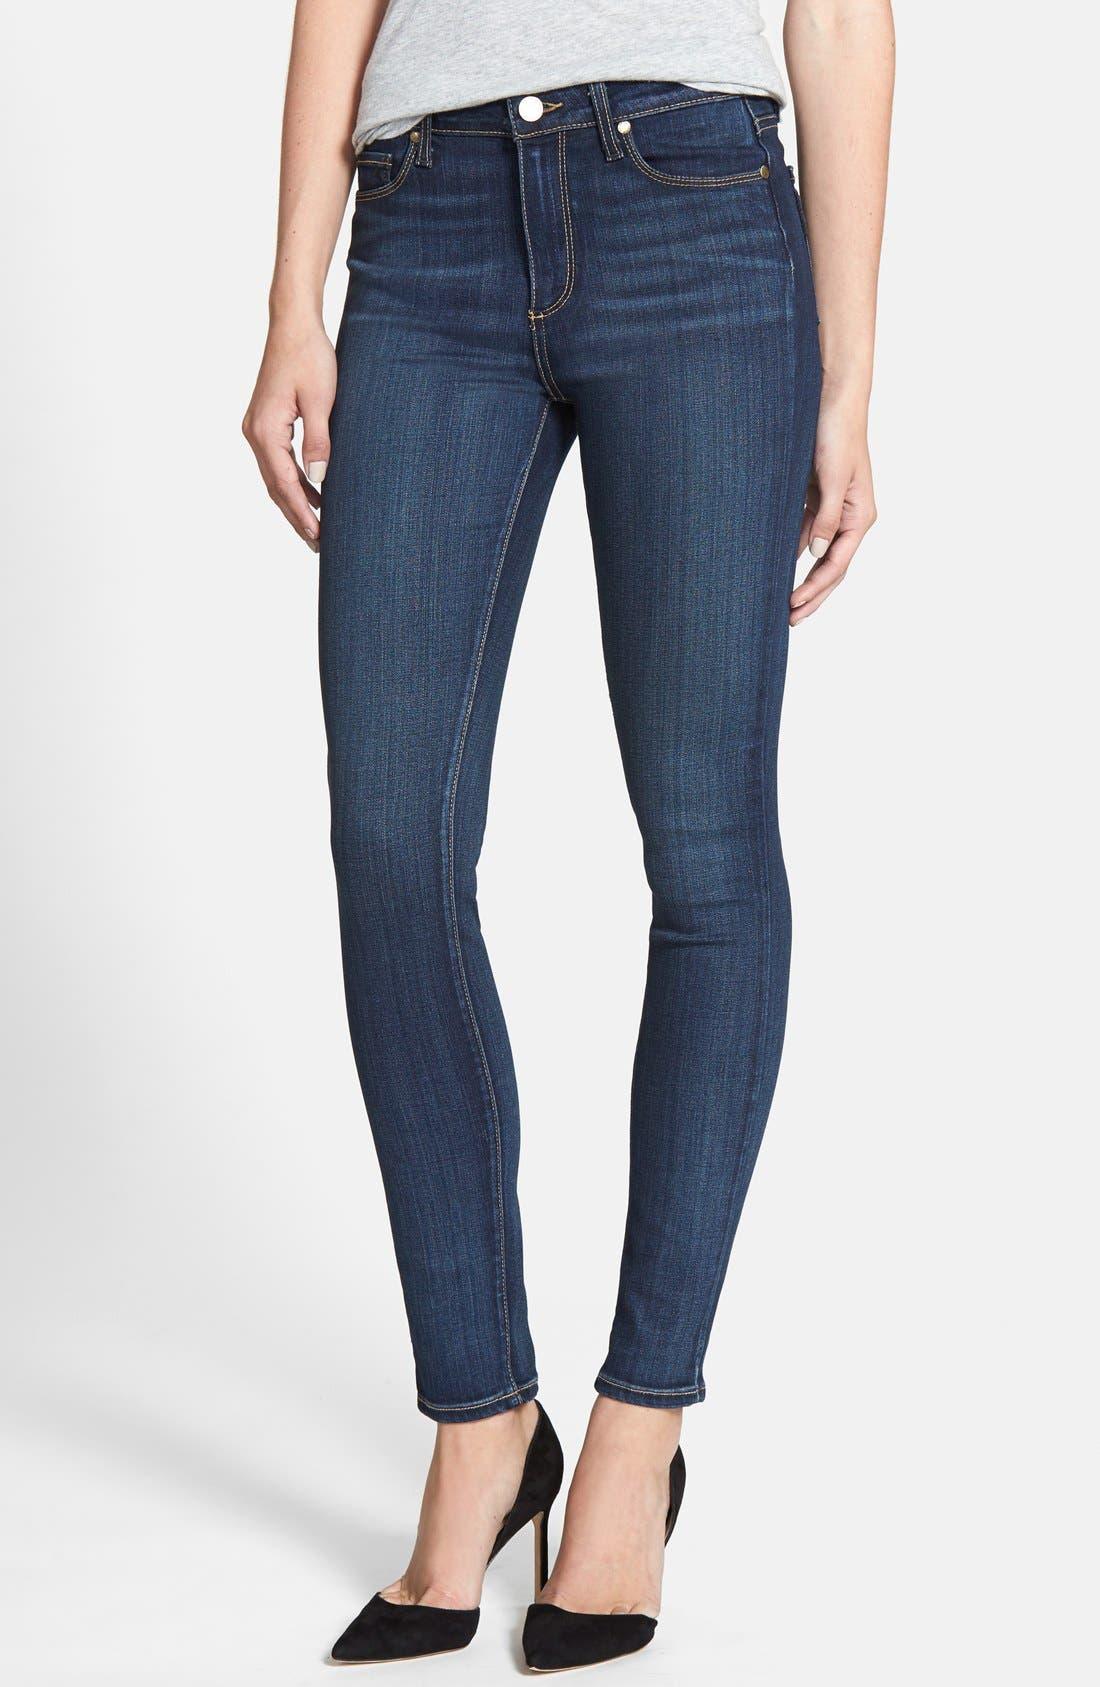 PAIGE Transcend - Hoxton High Waist Skinny Jeans (Vista)